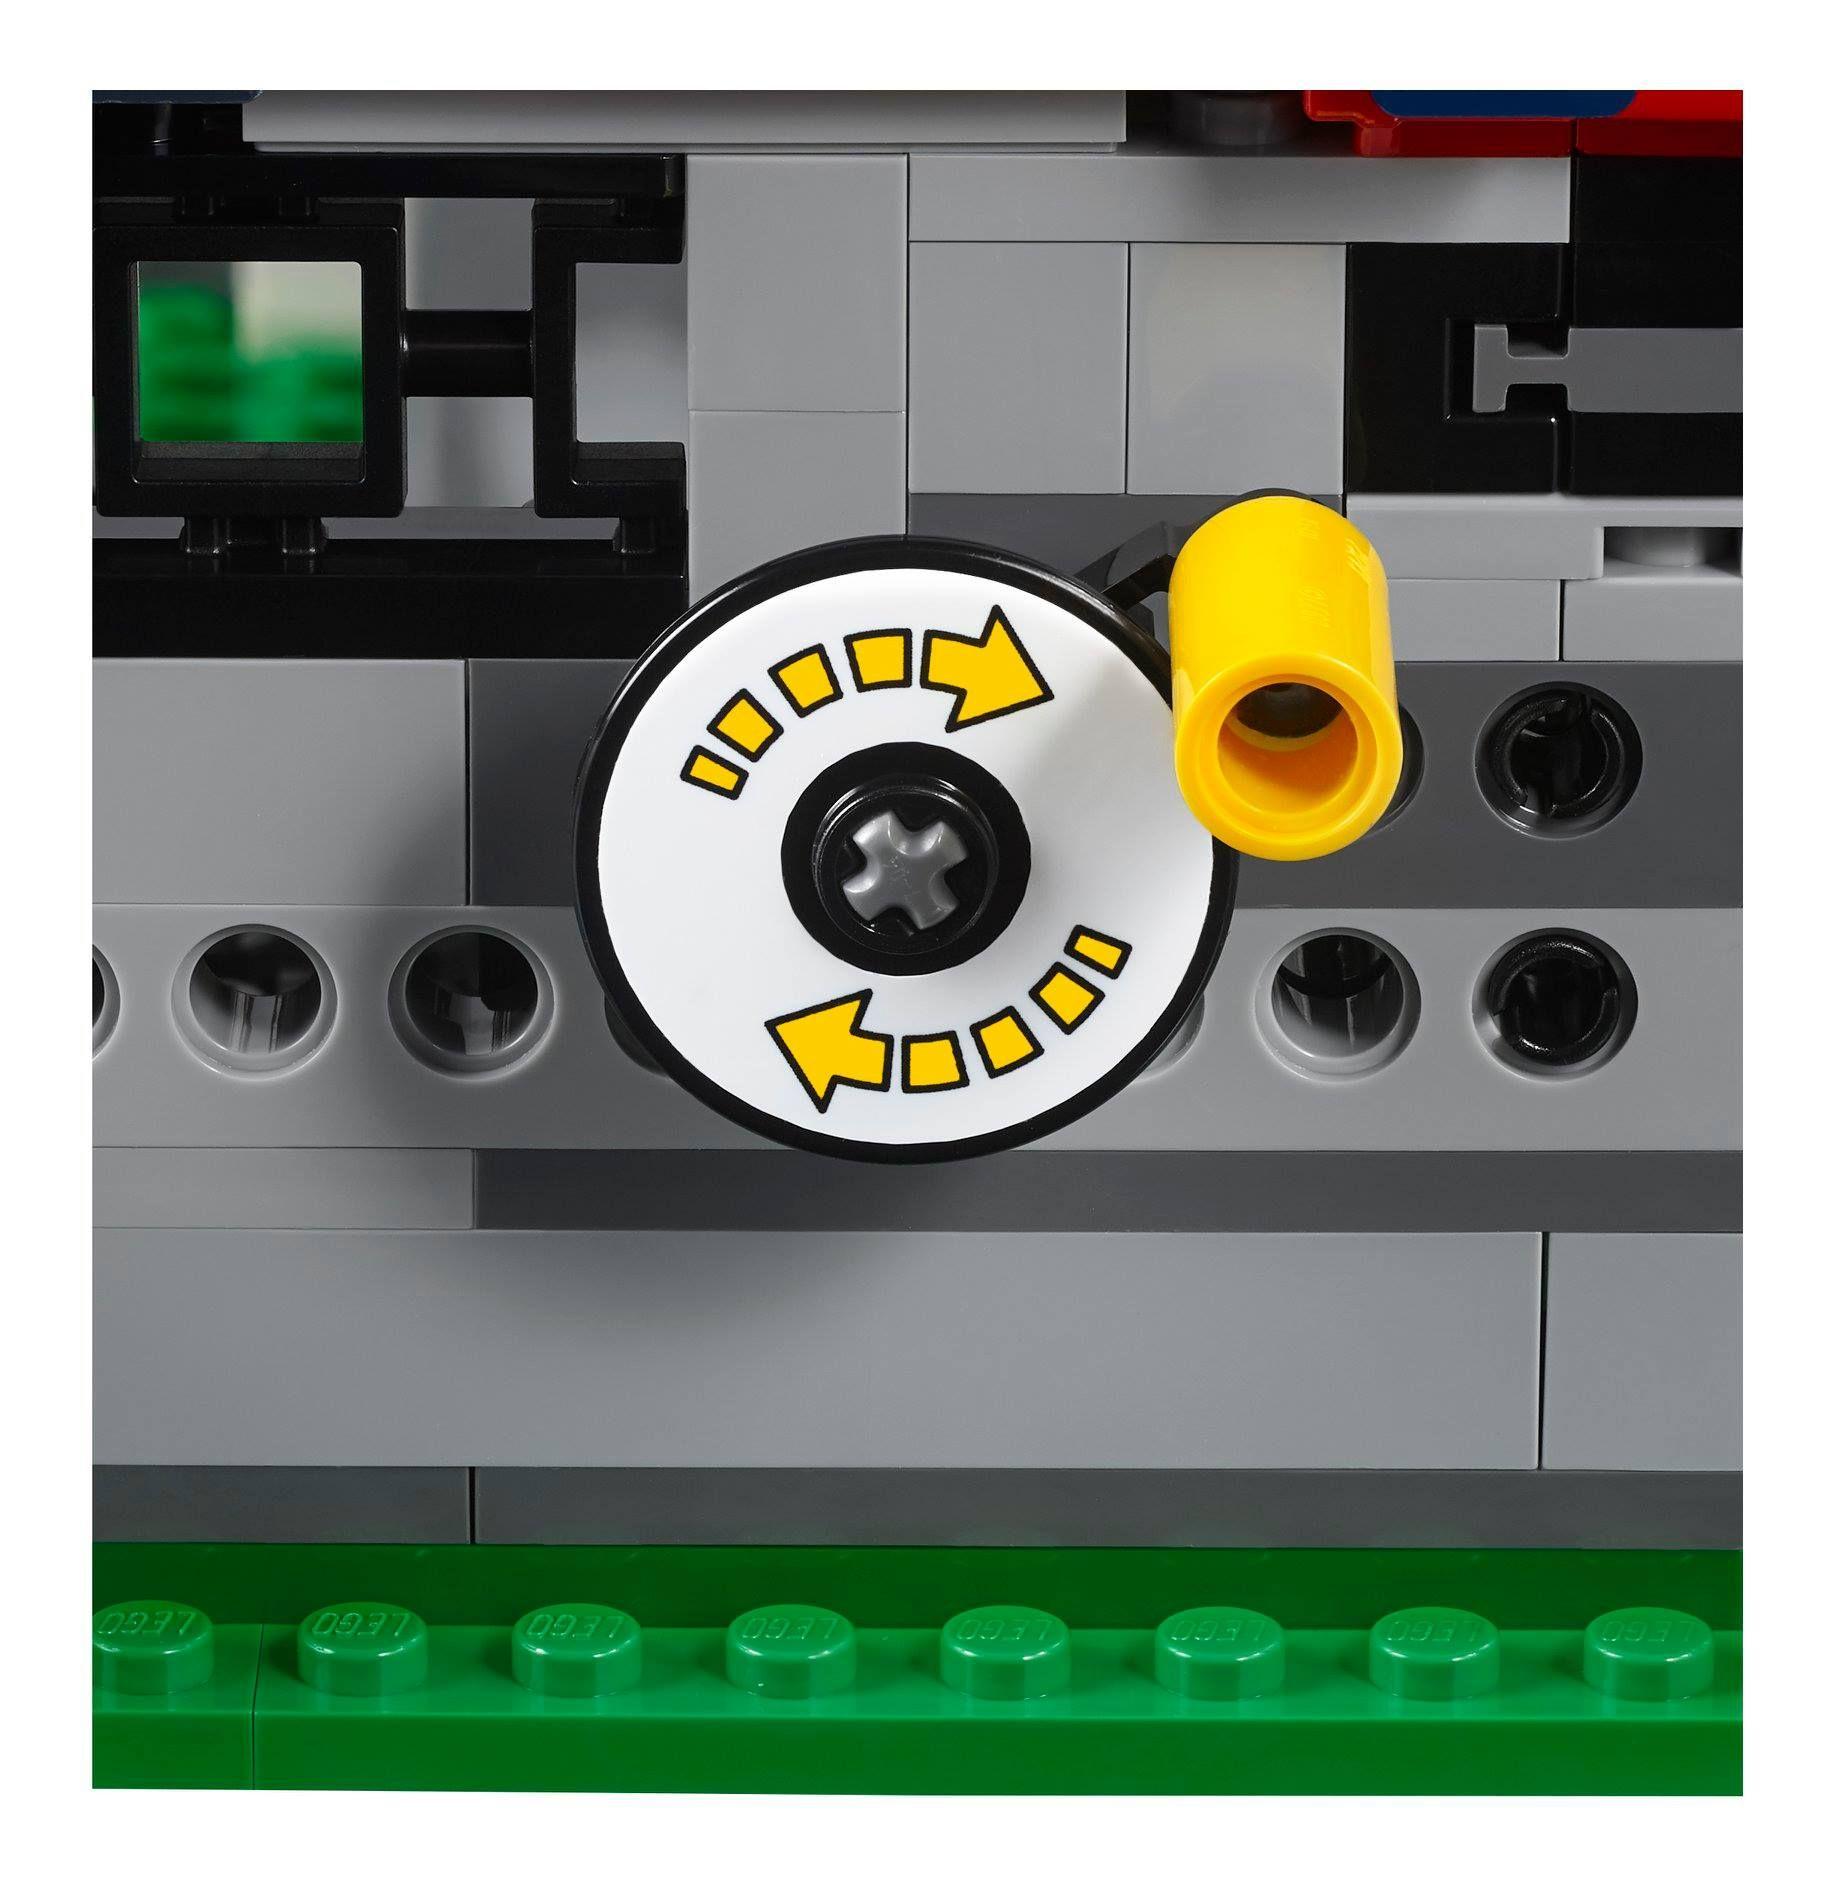 LEGO® Creator Expert Achterbahn (10261) - Bild 12 | ©LEGO Gruppe